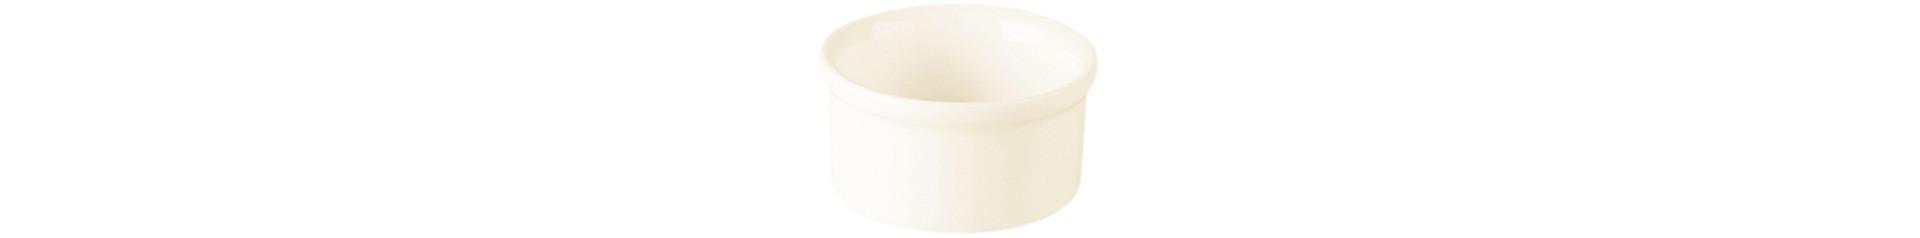 Banquet, Butterschälchen ø 67 mm / 0,06 l creme